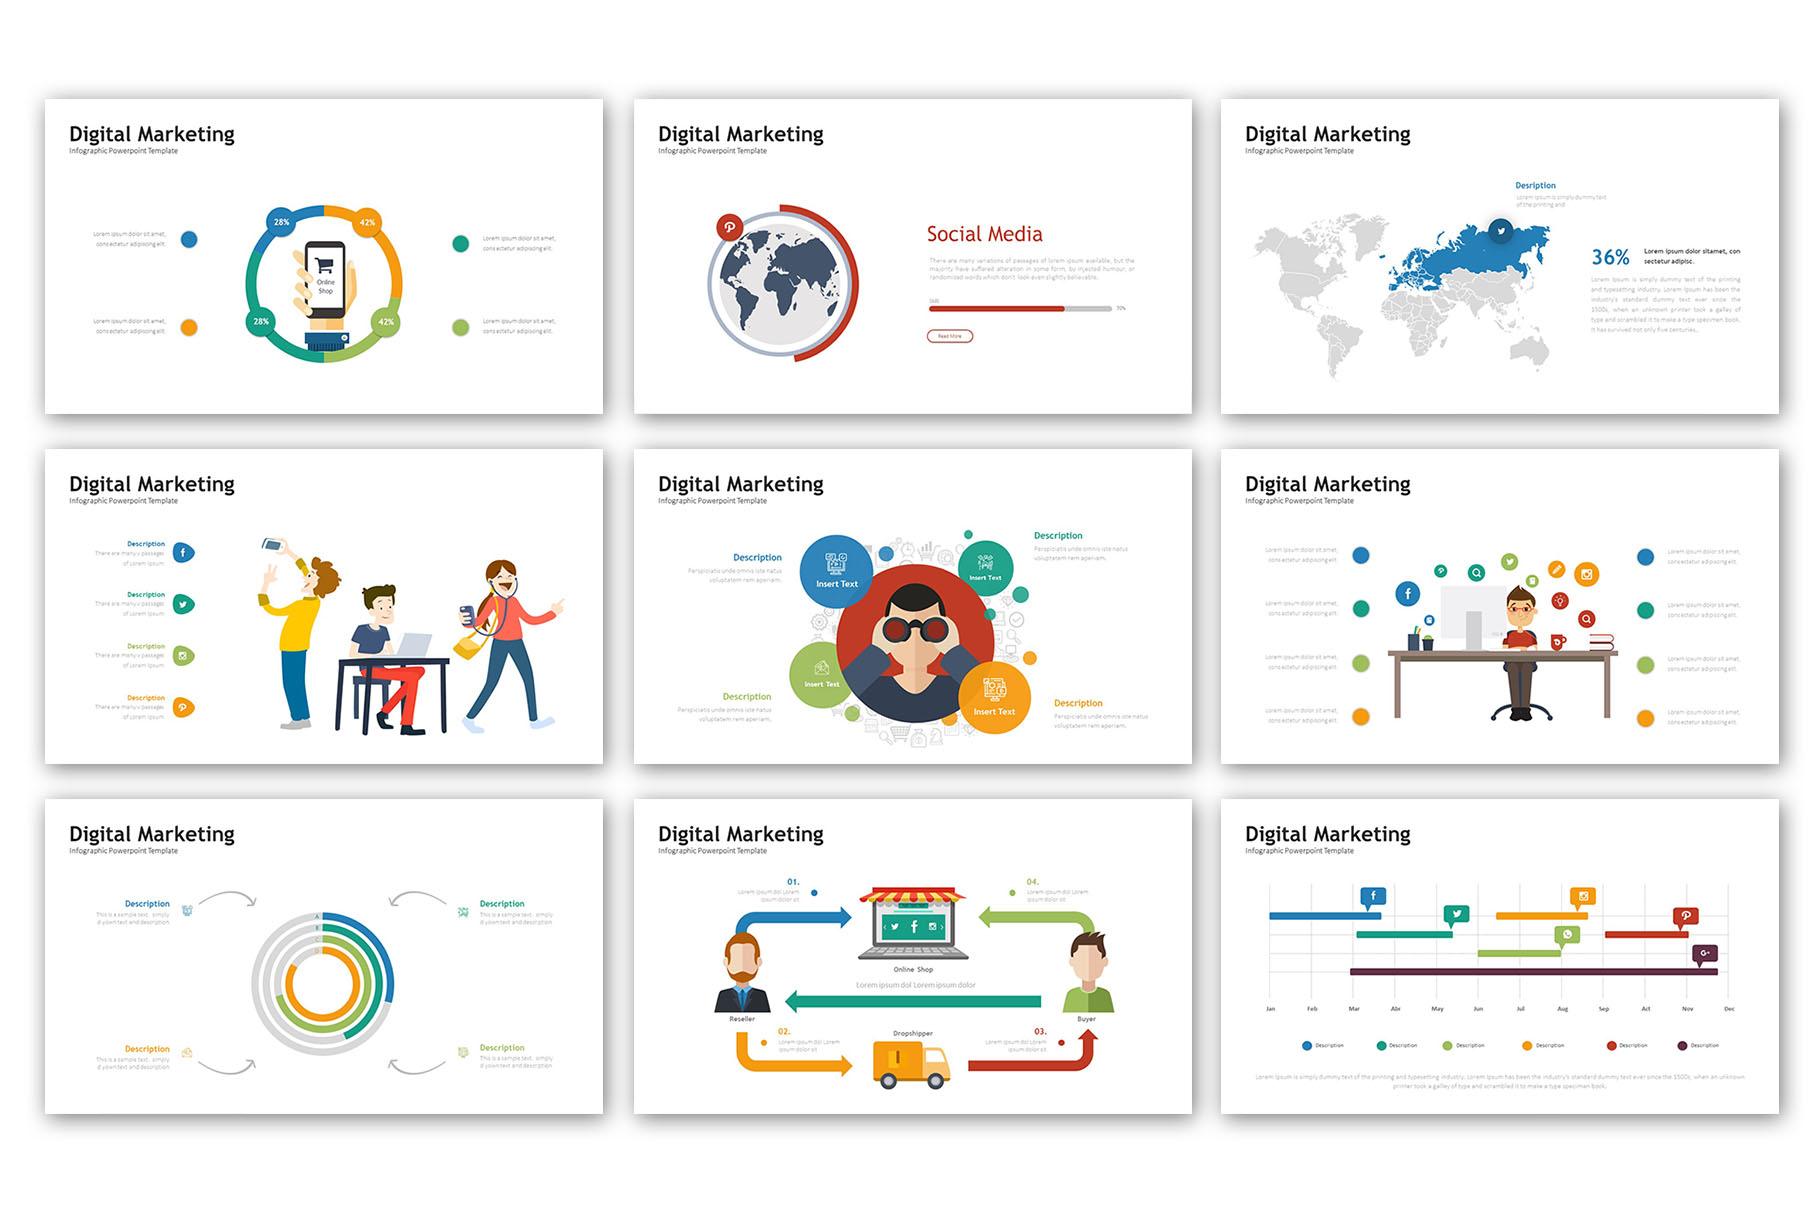 Digital Marketing Presentation - Infographic Template example image 3